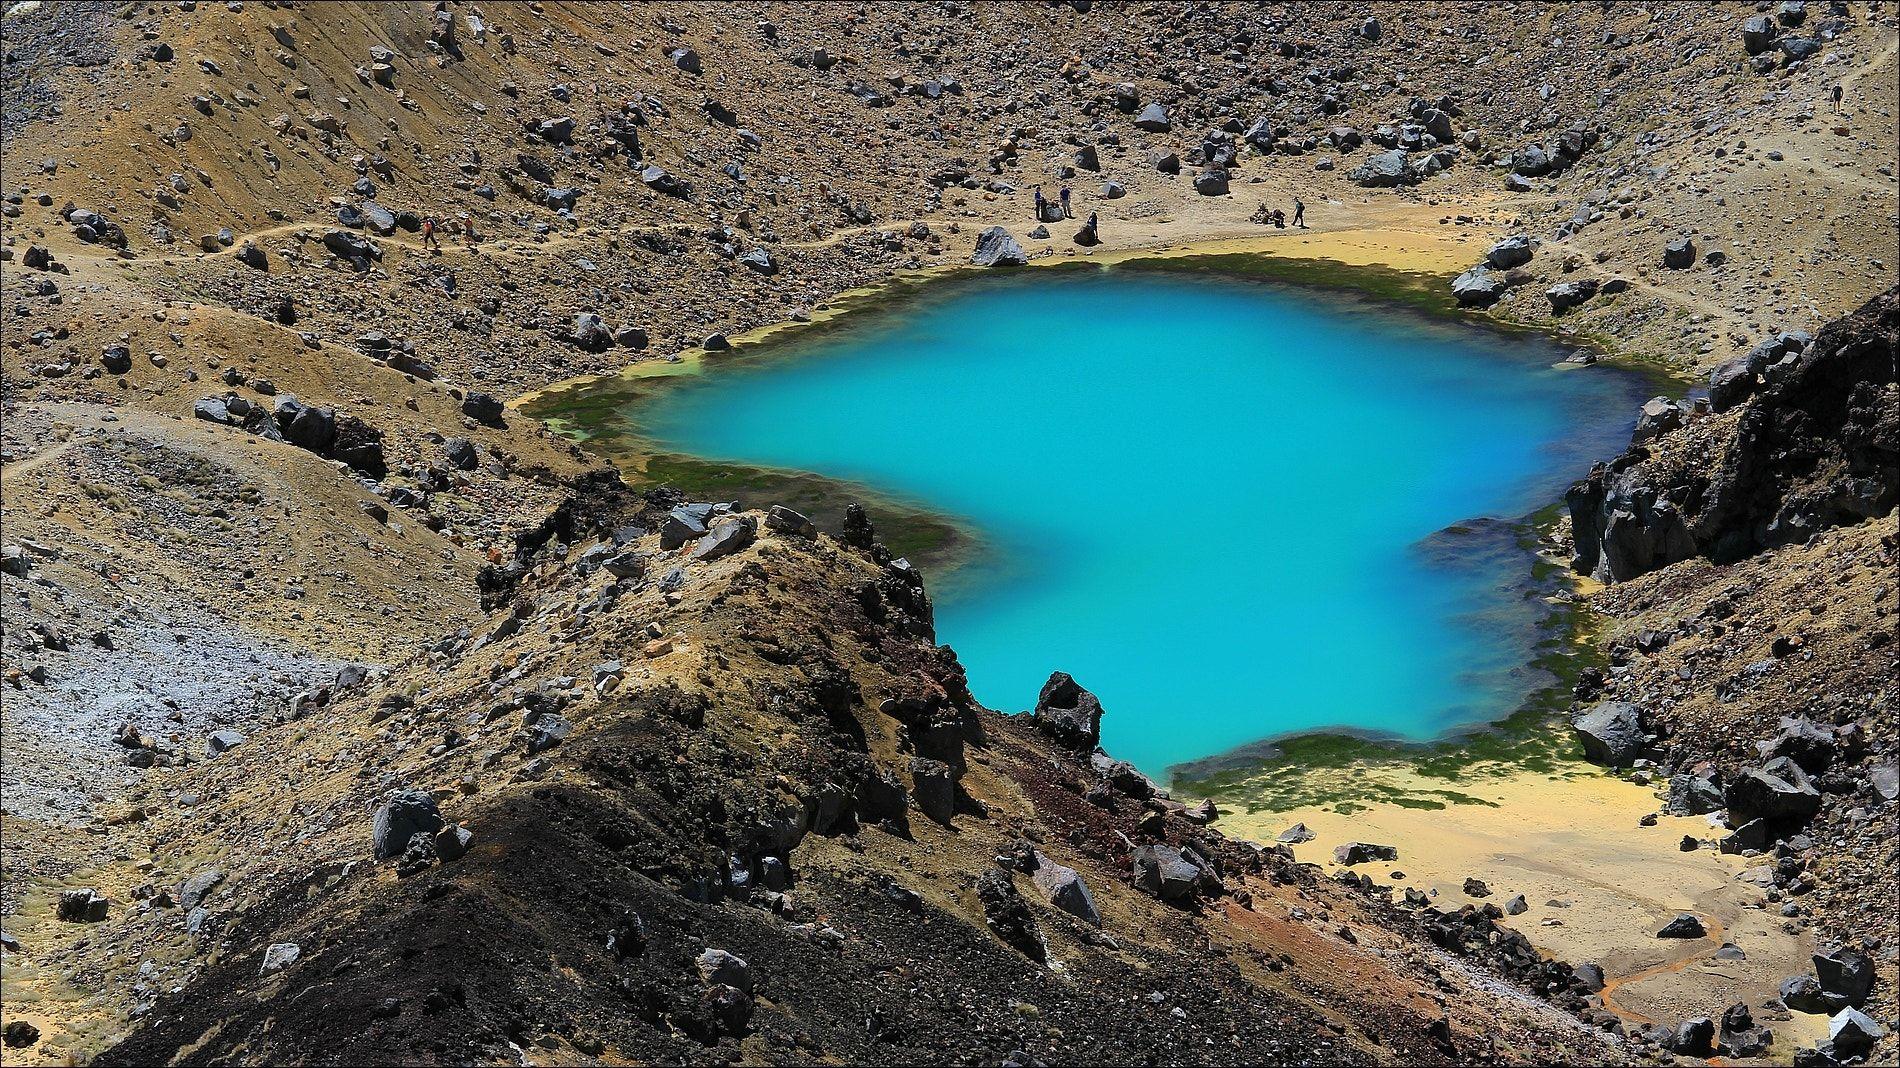 Emerald lakes - Tongariro Alpine Crossing - North island - New Zealand